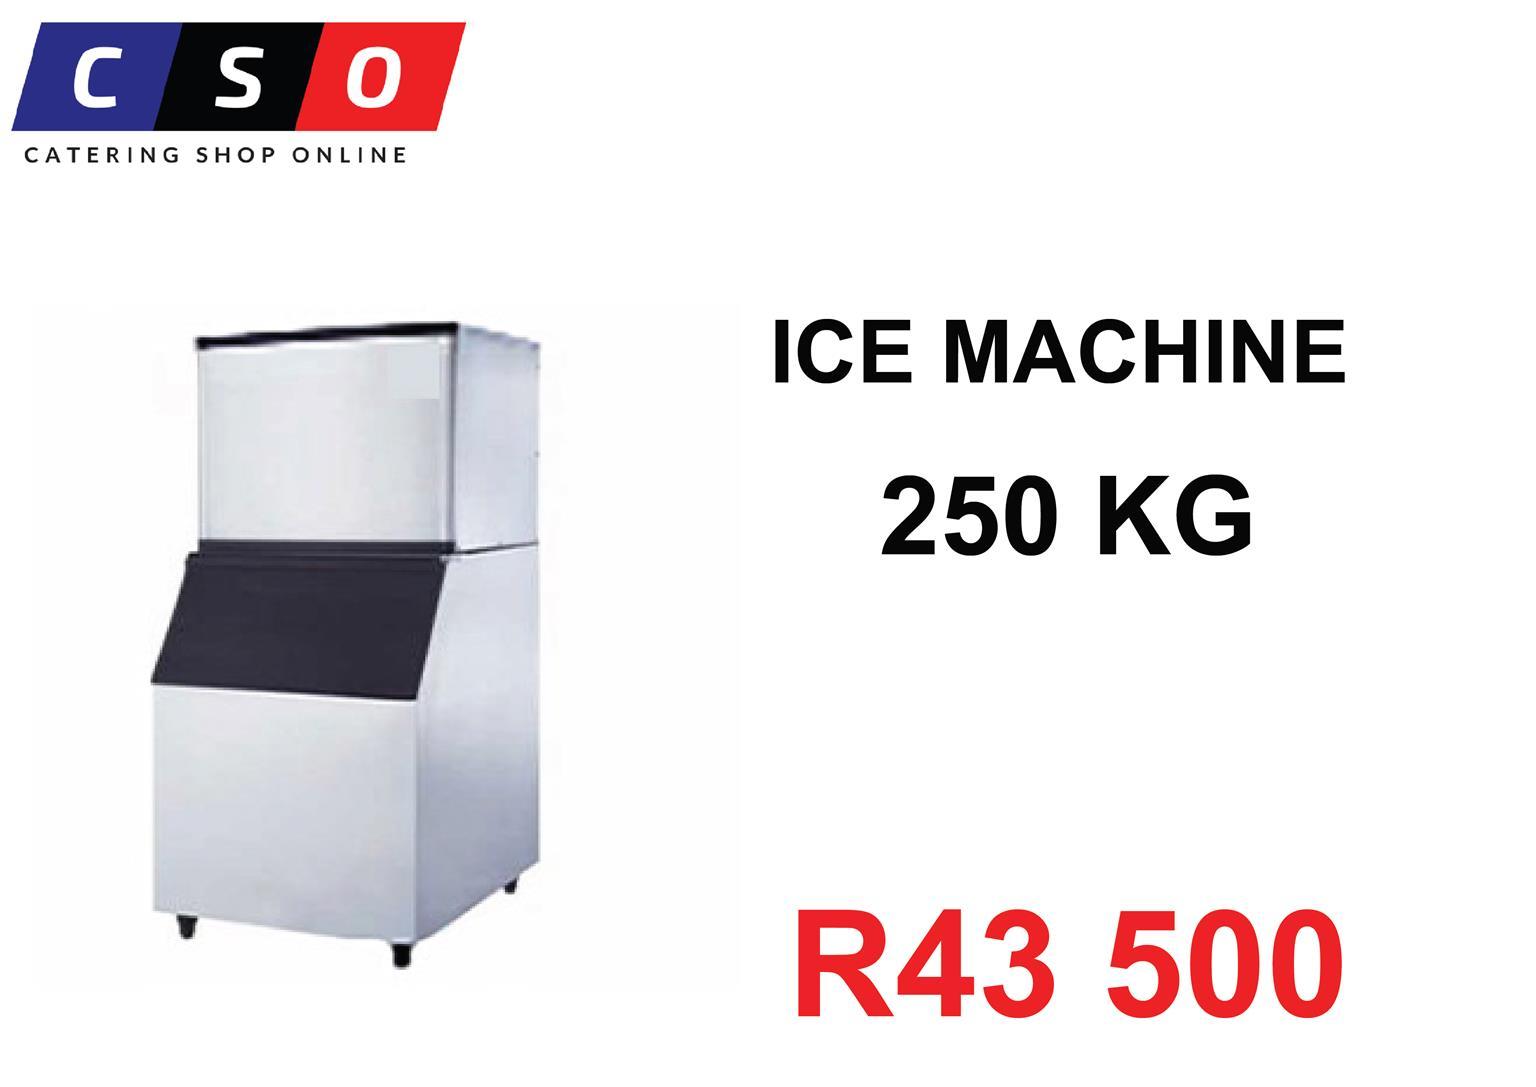 ICE MACHINE SPECIAL DEALS LOW PRICE